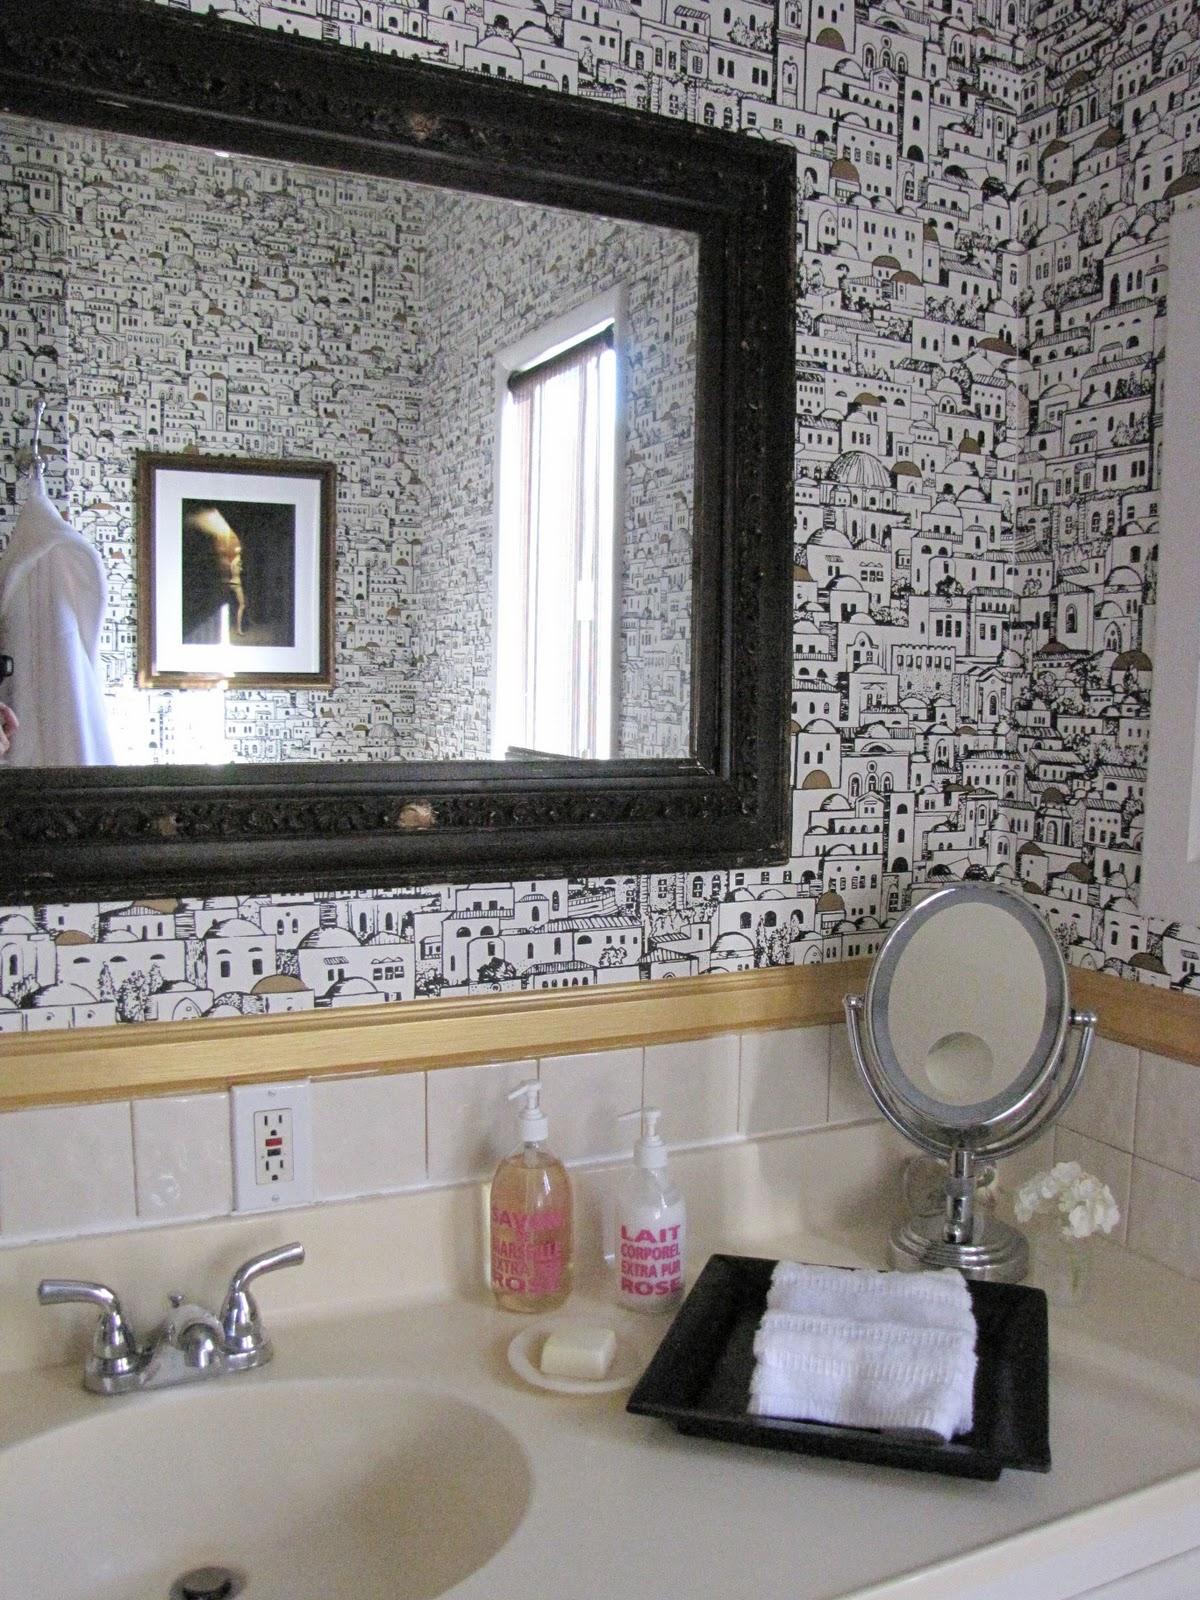 http://1.bp.blogspot.com/_6A_zv9x_Vdw/TP3INxirOaI/AAAAAAAAAfQ/EfmAXCZfL6k/s1600/fornasetti+bath.jpg